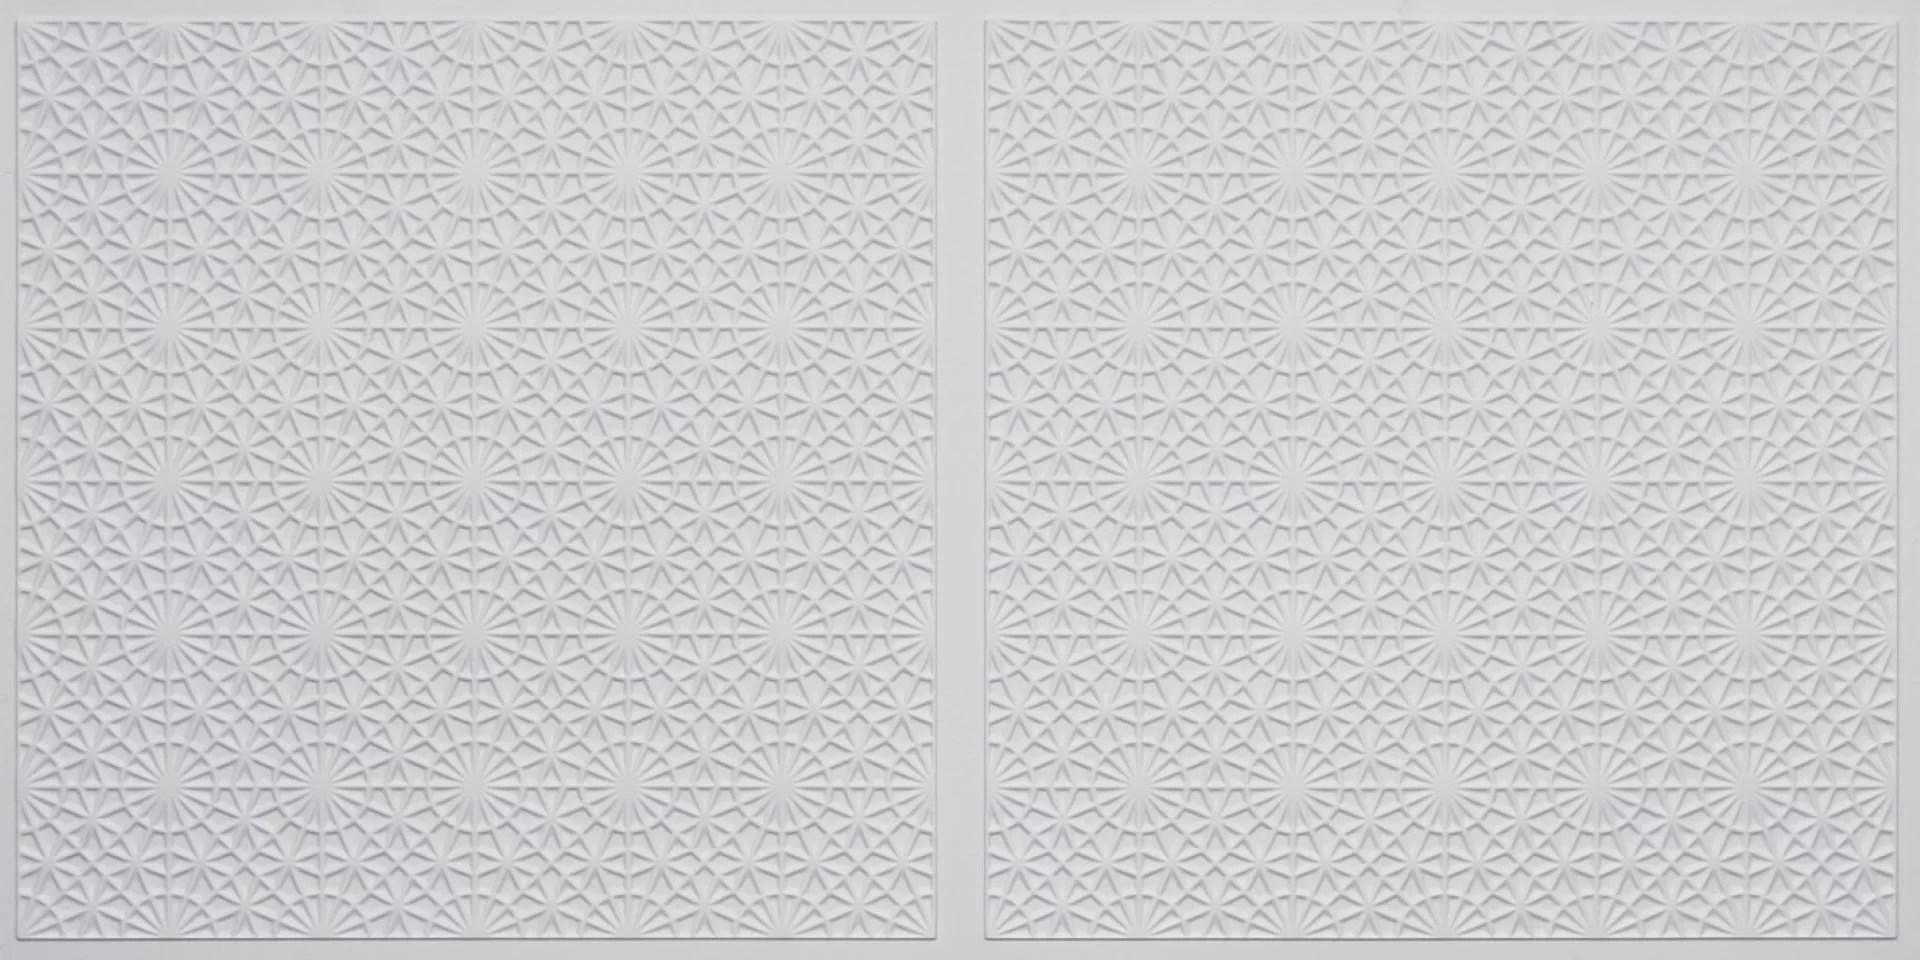 Ft803 Faux Tin Ceiling Tile